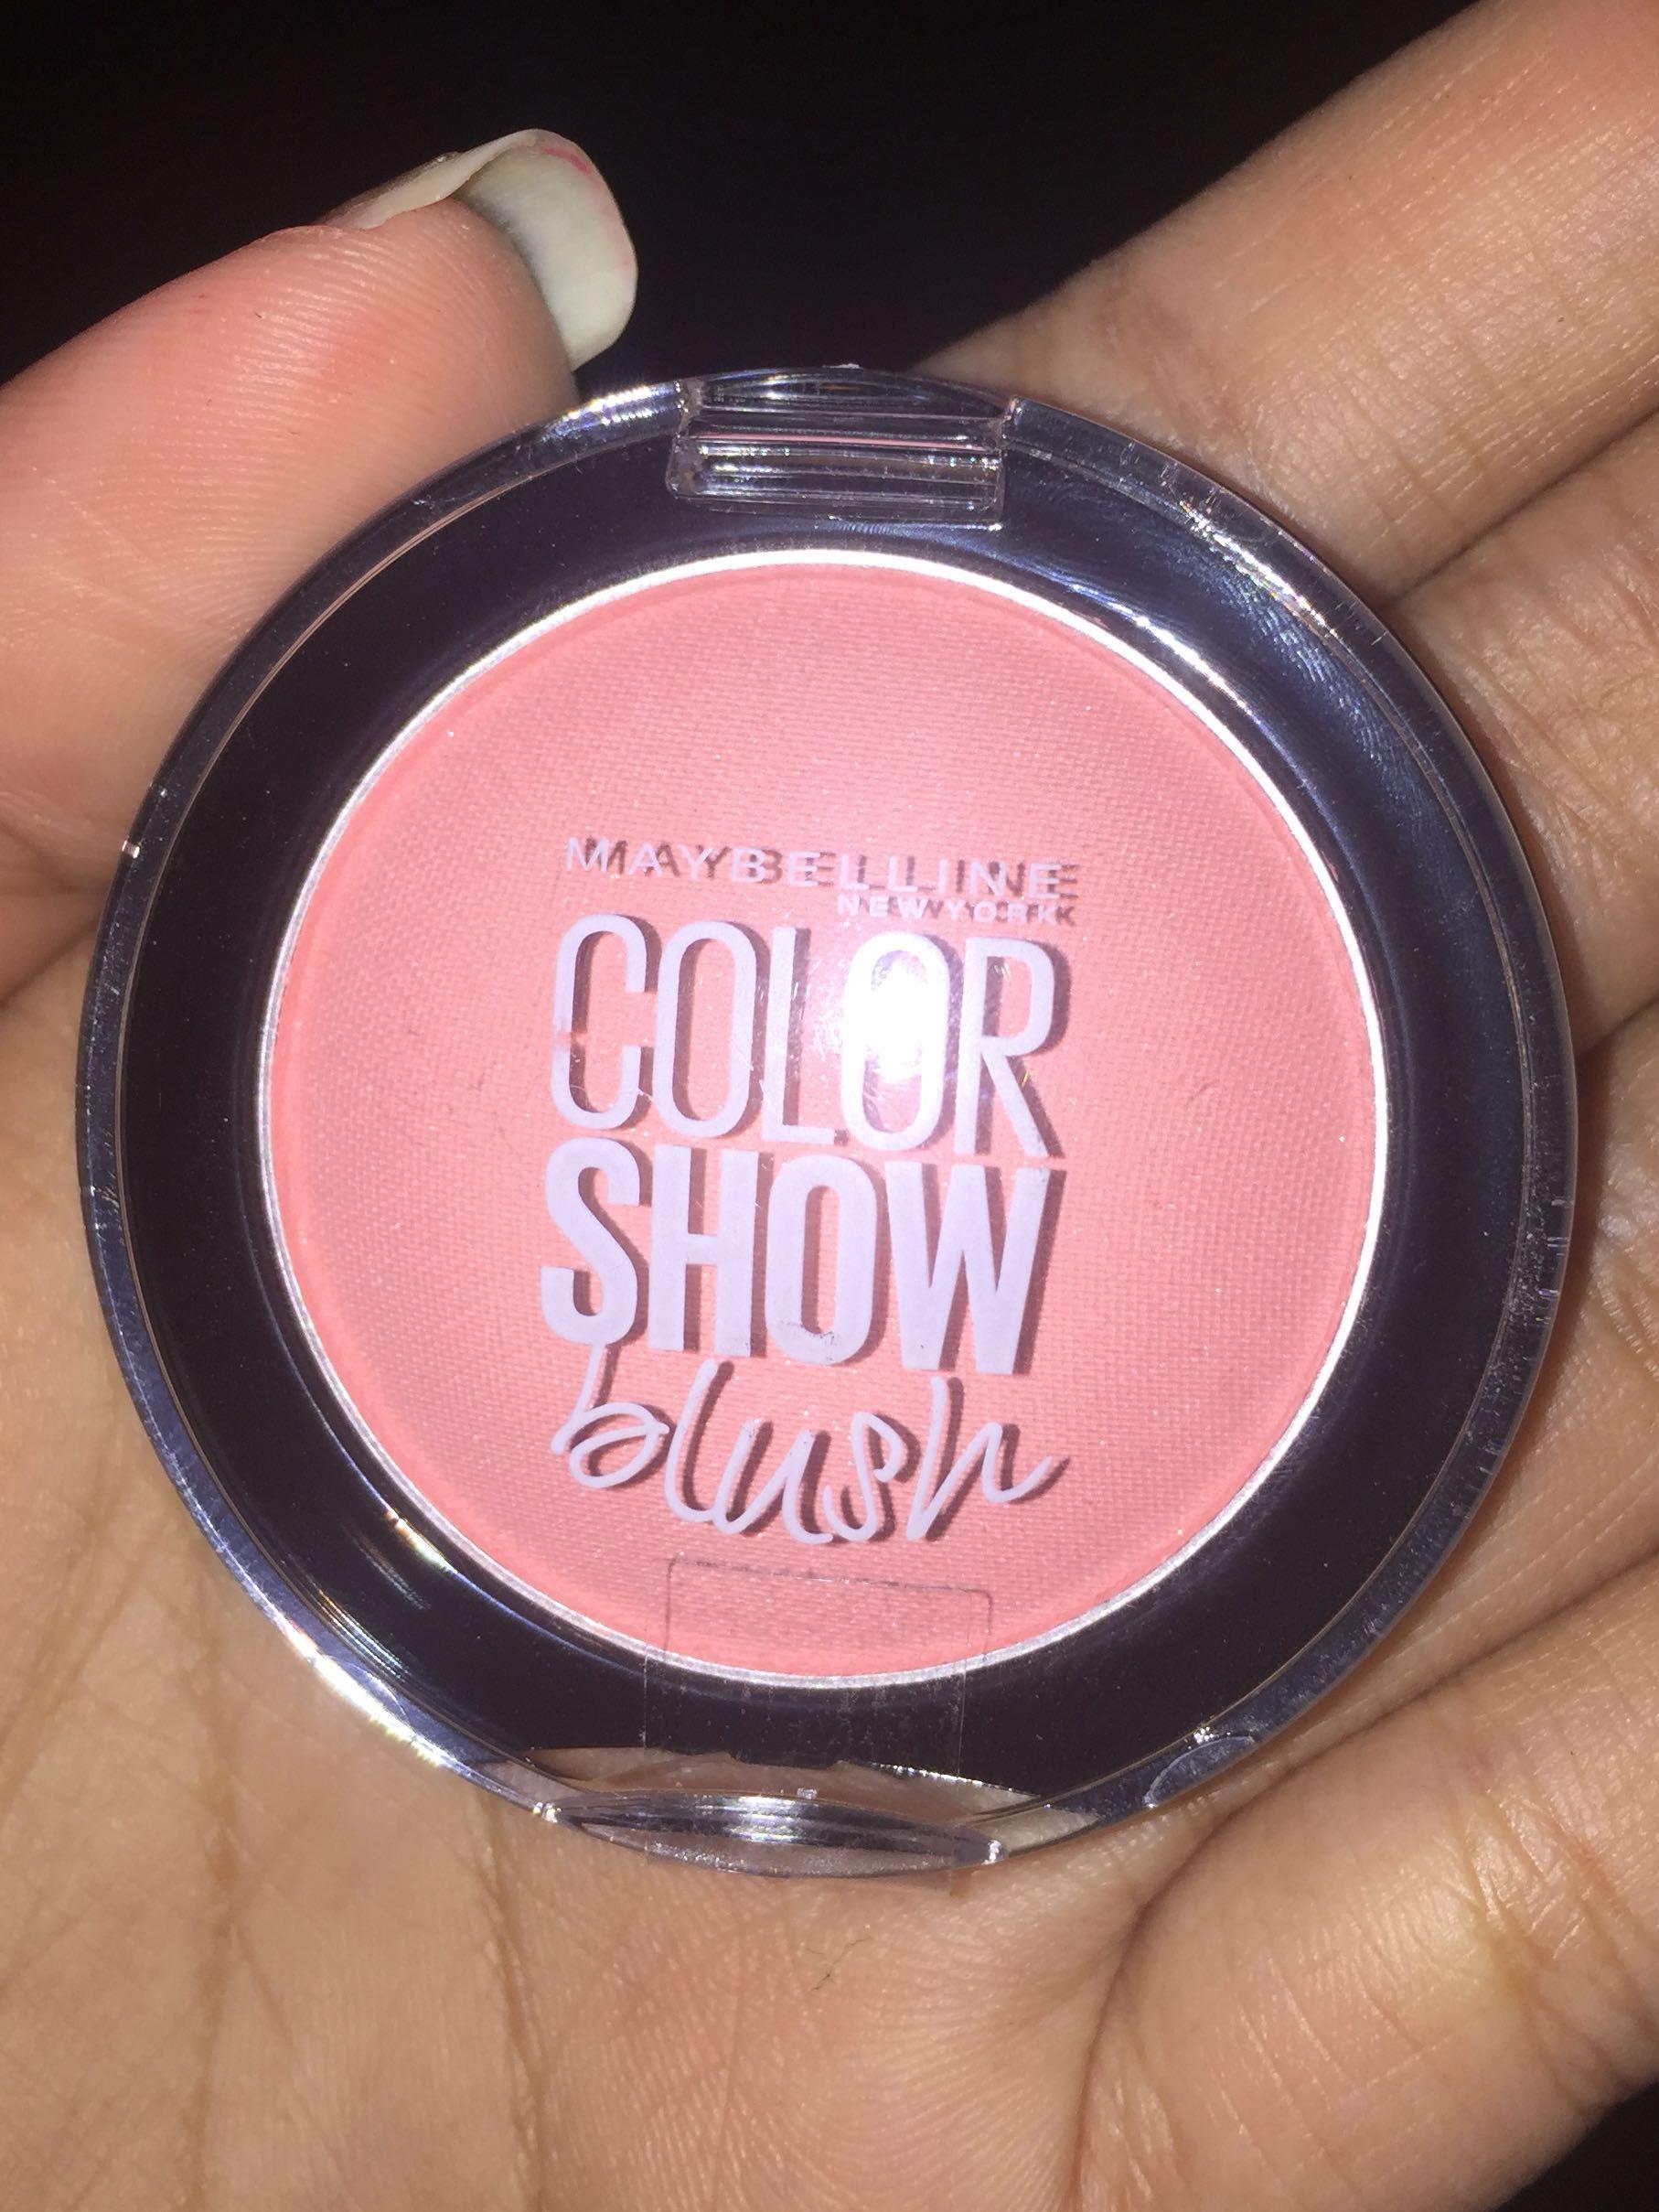 New Maybelline Color Show Blush Kesehatan Kecantikan Rias Wajah On Di Carousell